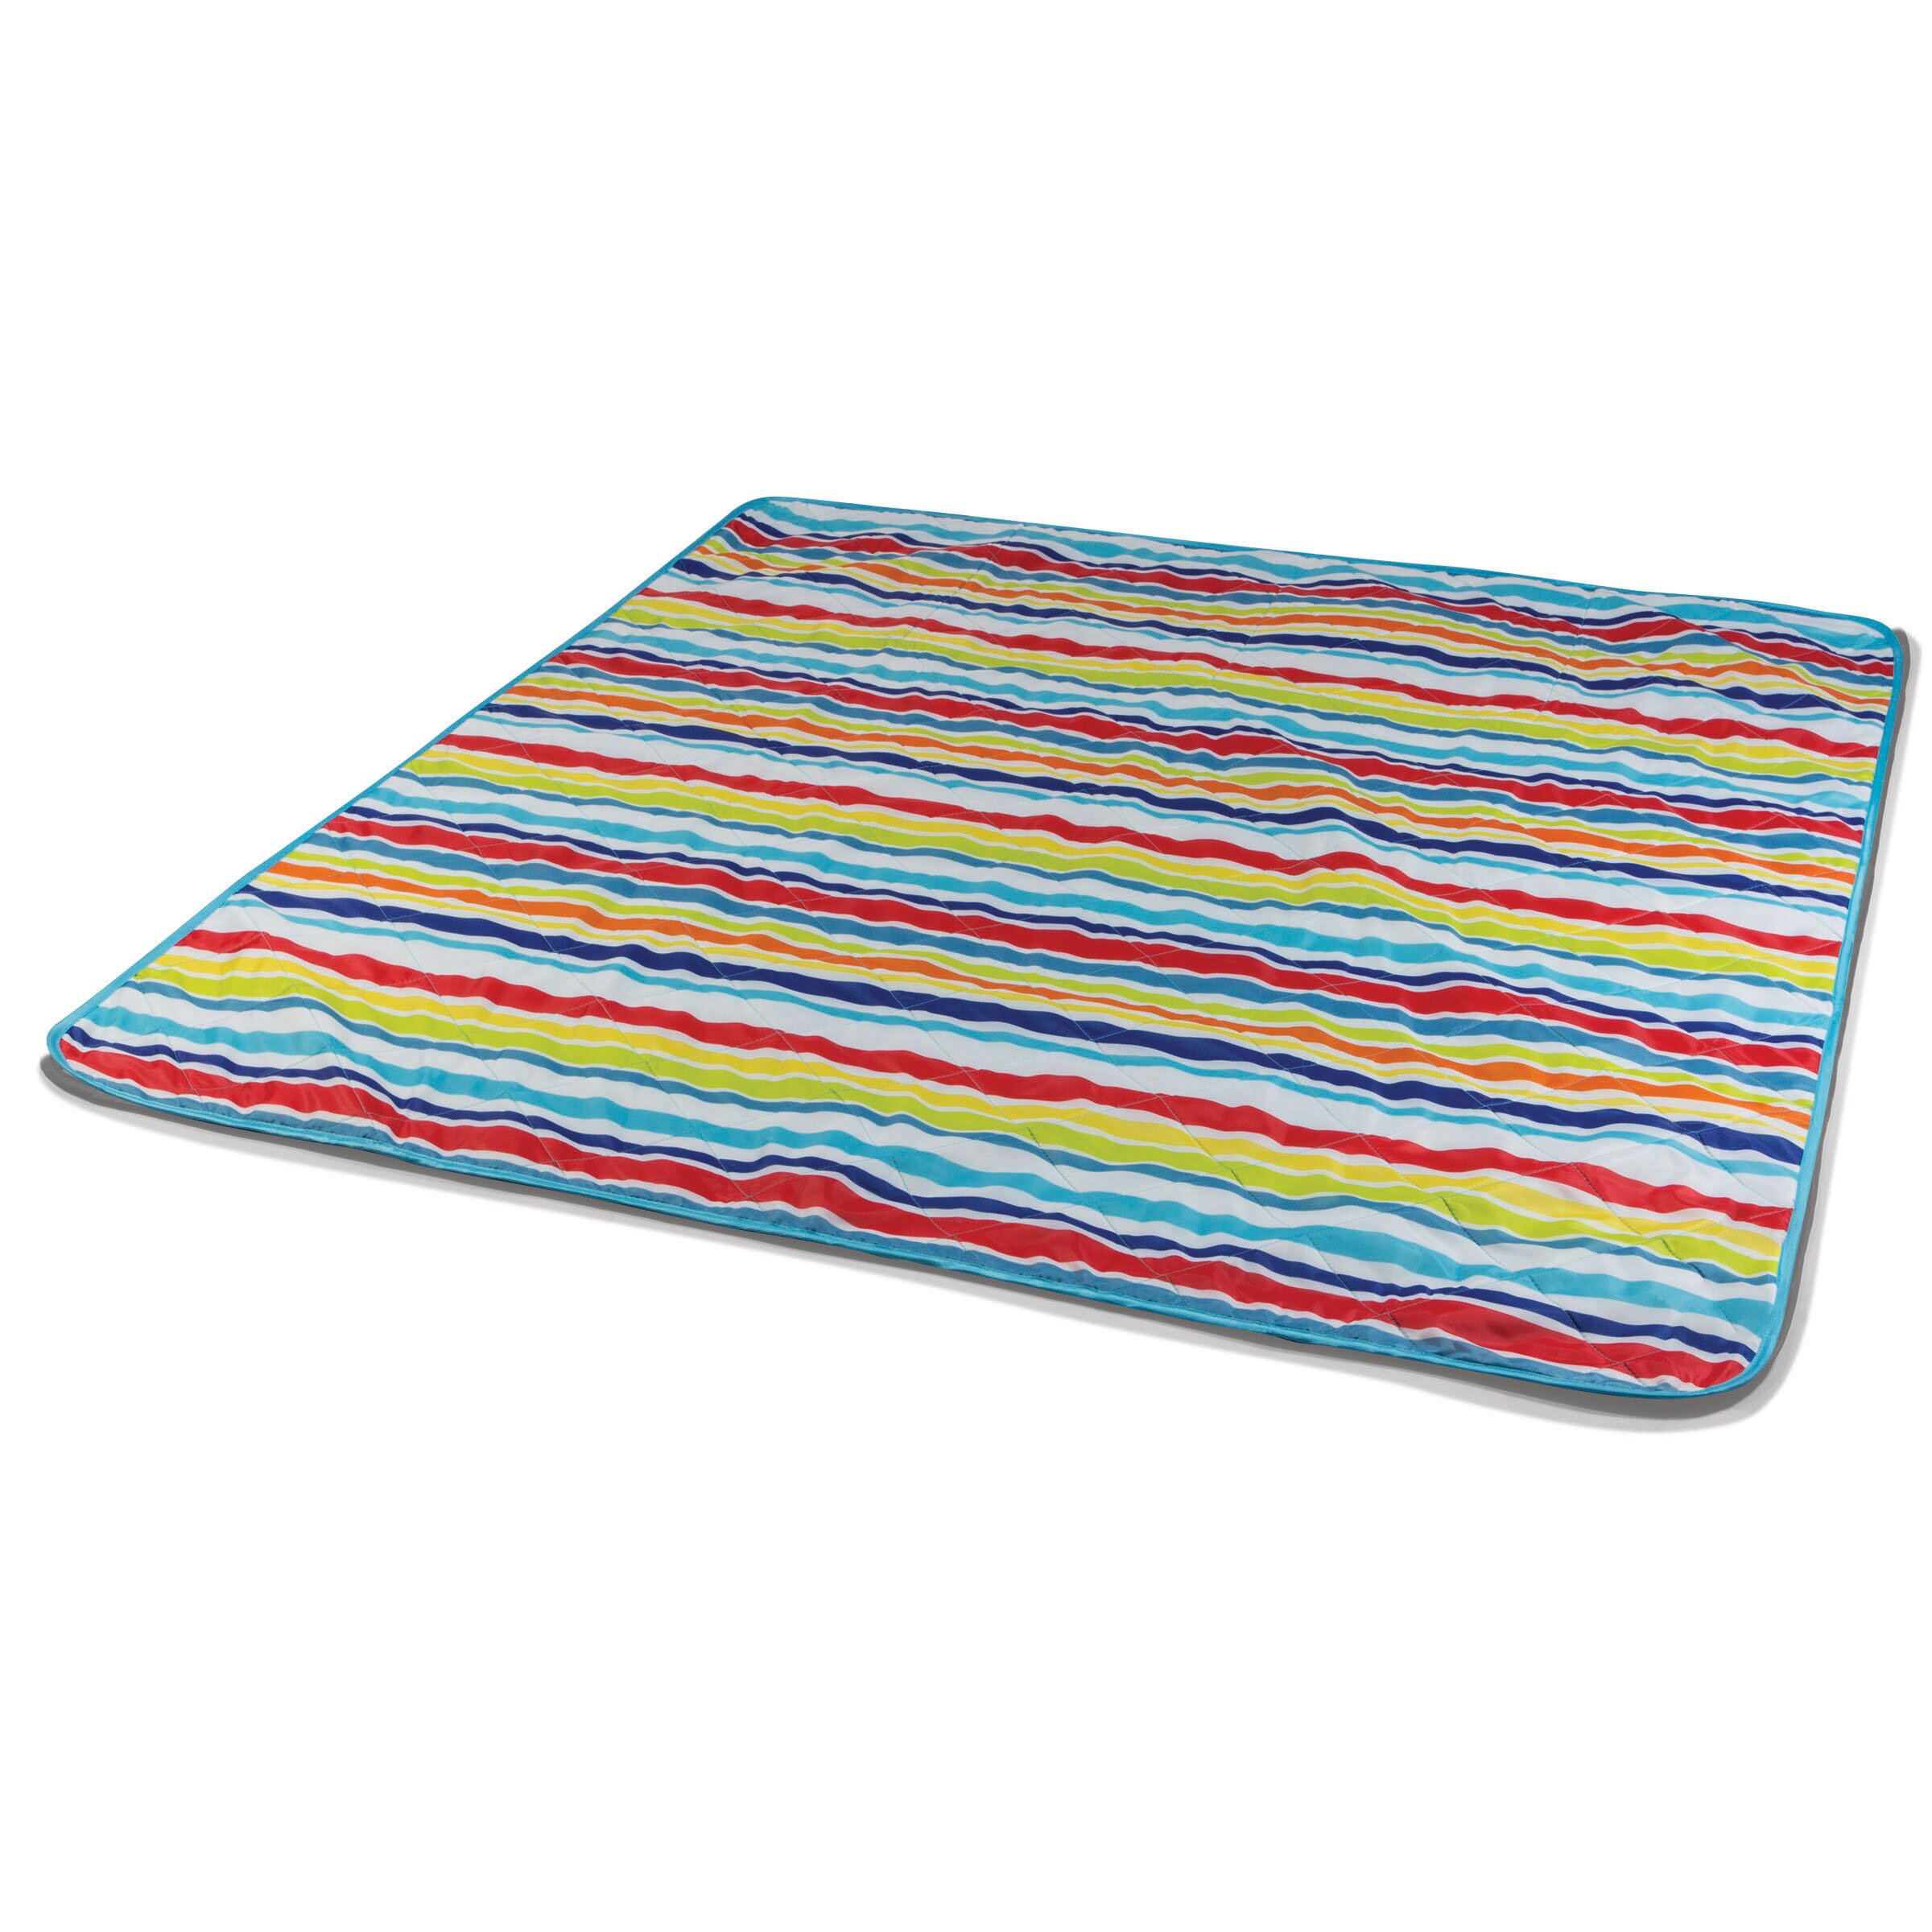 Picnic Blanket: Picnic Time Vista Outdoor Blanket & Reviews